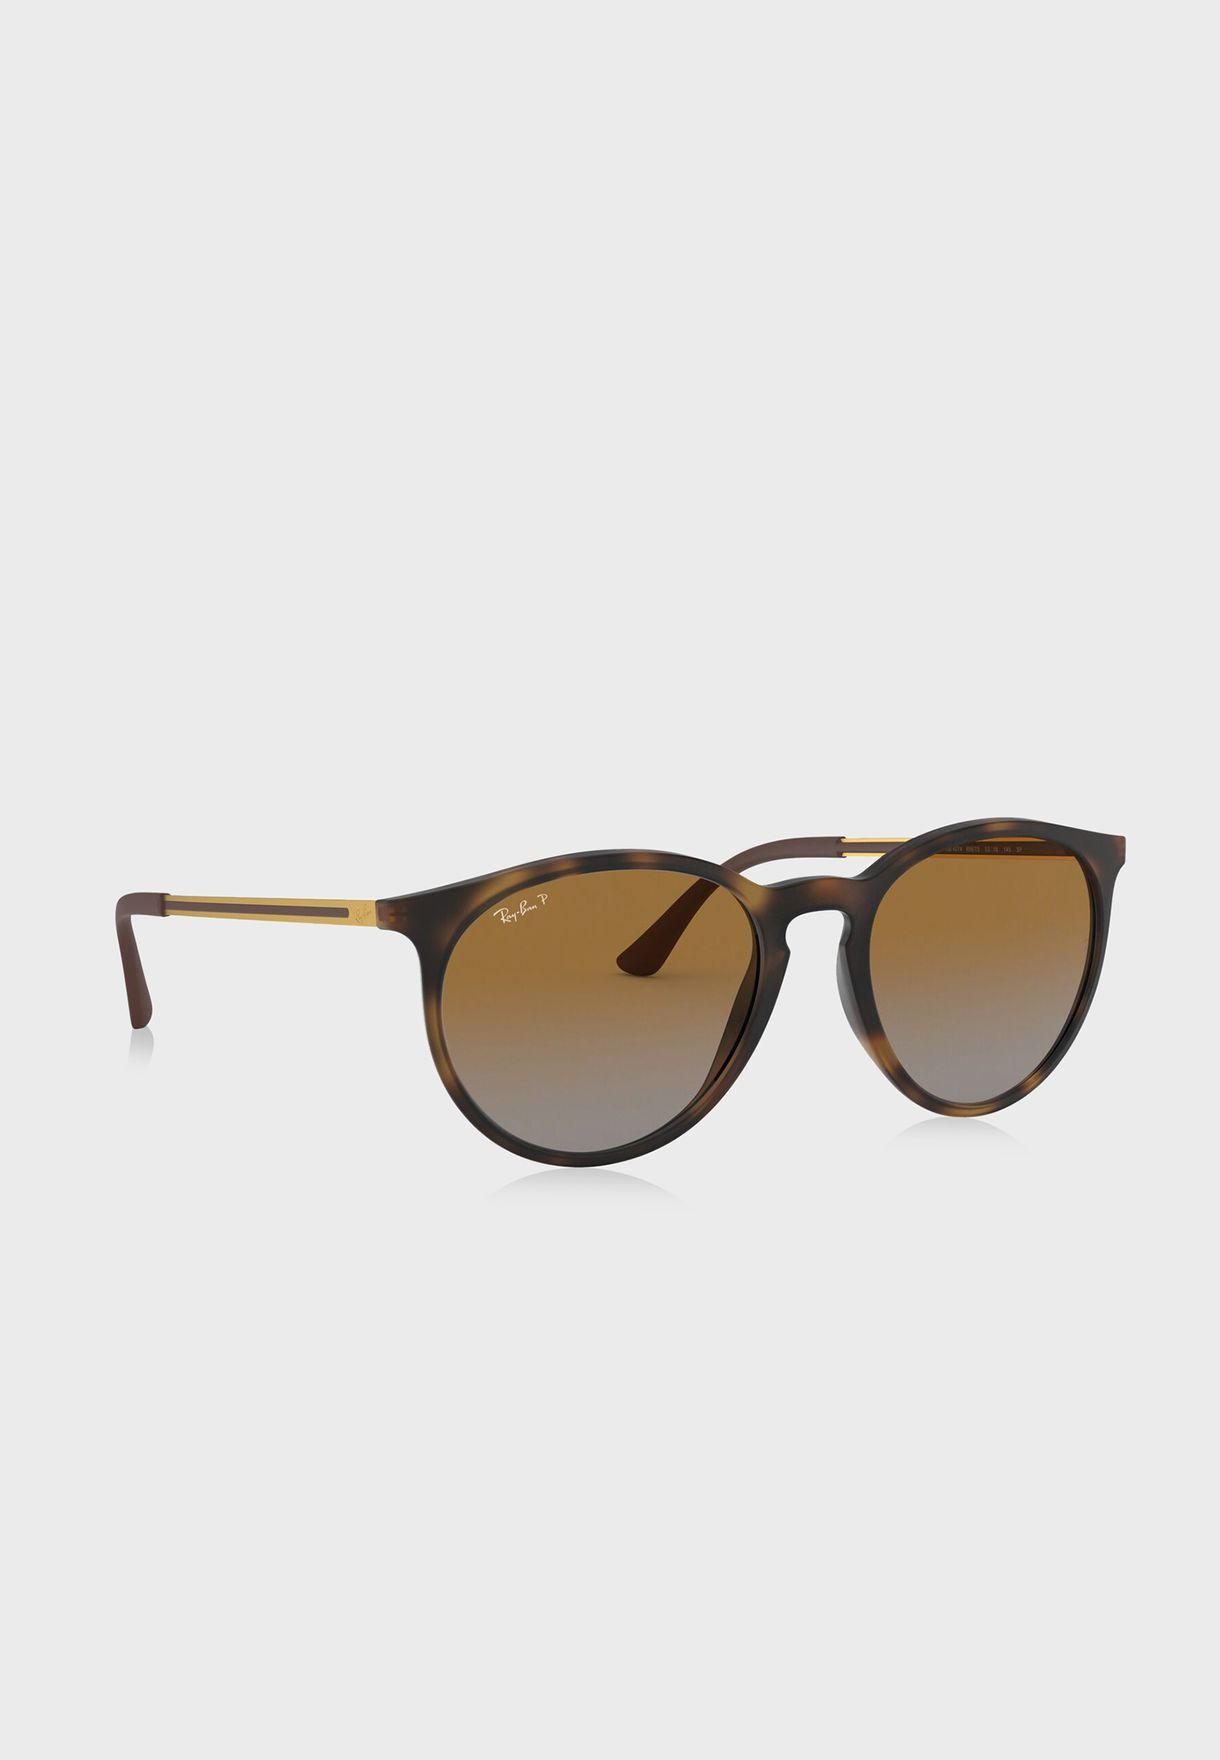 0RB4274 Erika Cateye Sunglasses